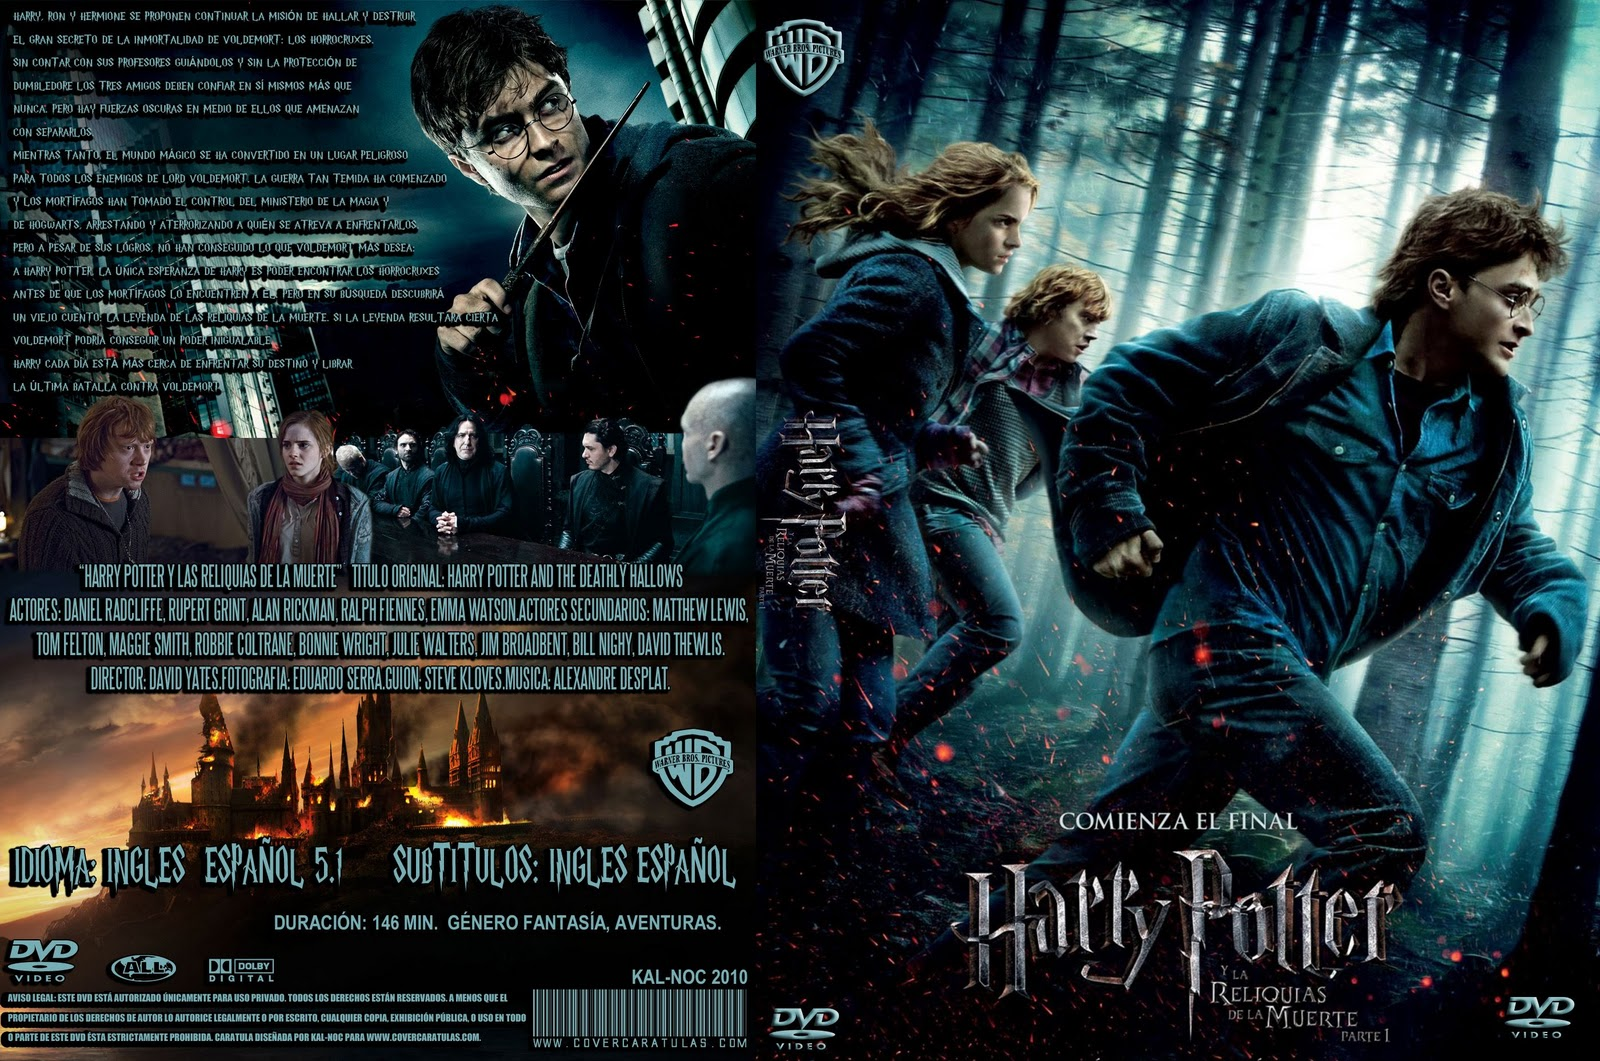 http://2.bp.blogspot.com/-nVT-EeJPr0Q/TdMtolOq5iI/AAAAAAAAAgI/Yg9Qq8yeBss/s1600/Harry_Potter_Y_Las_Reliquias_De_La_Muerte_-_Parte_1.jpg